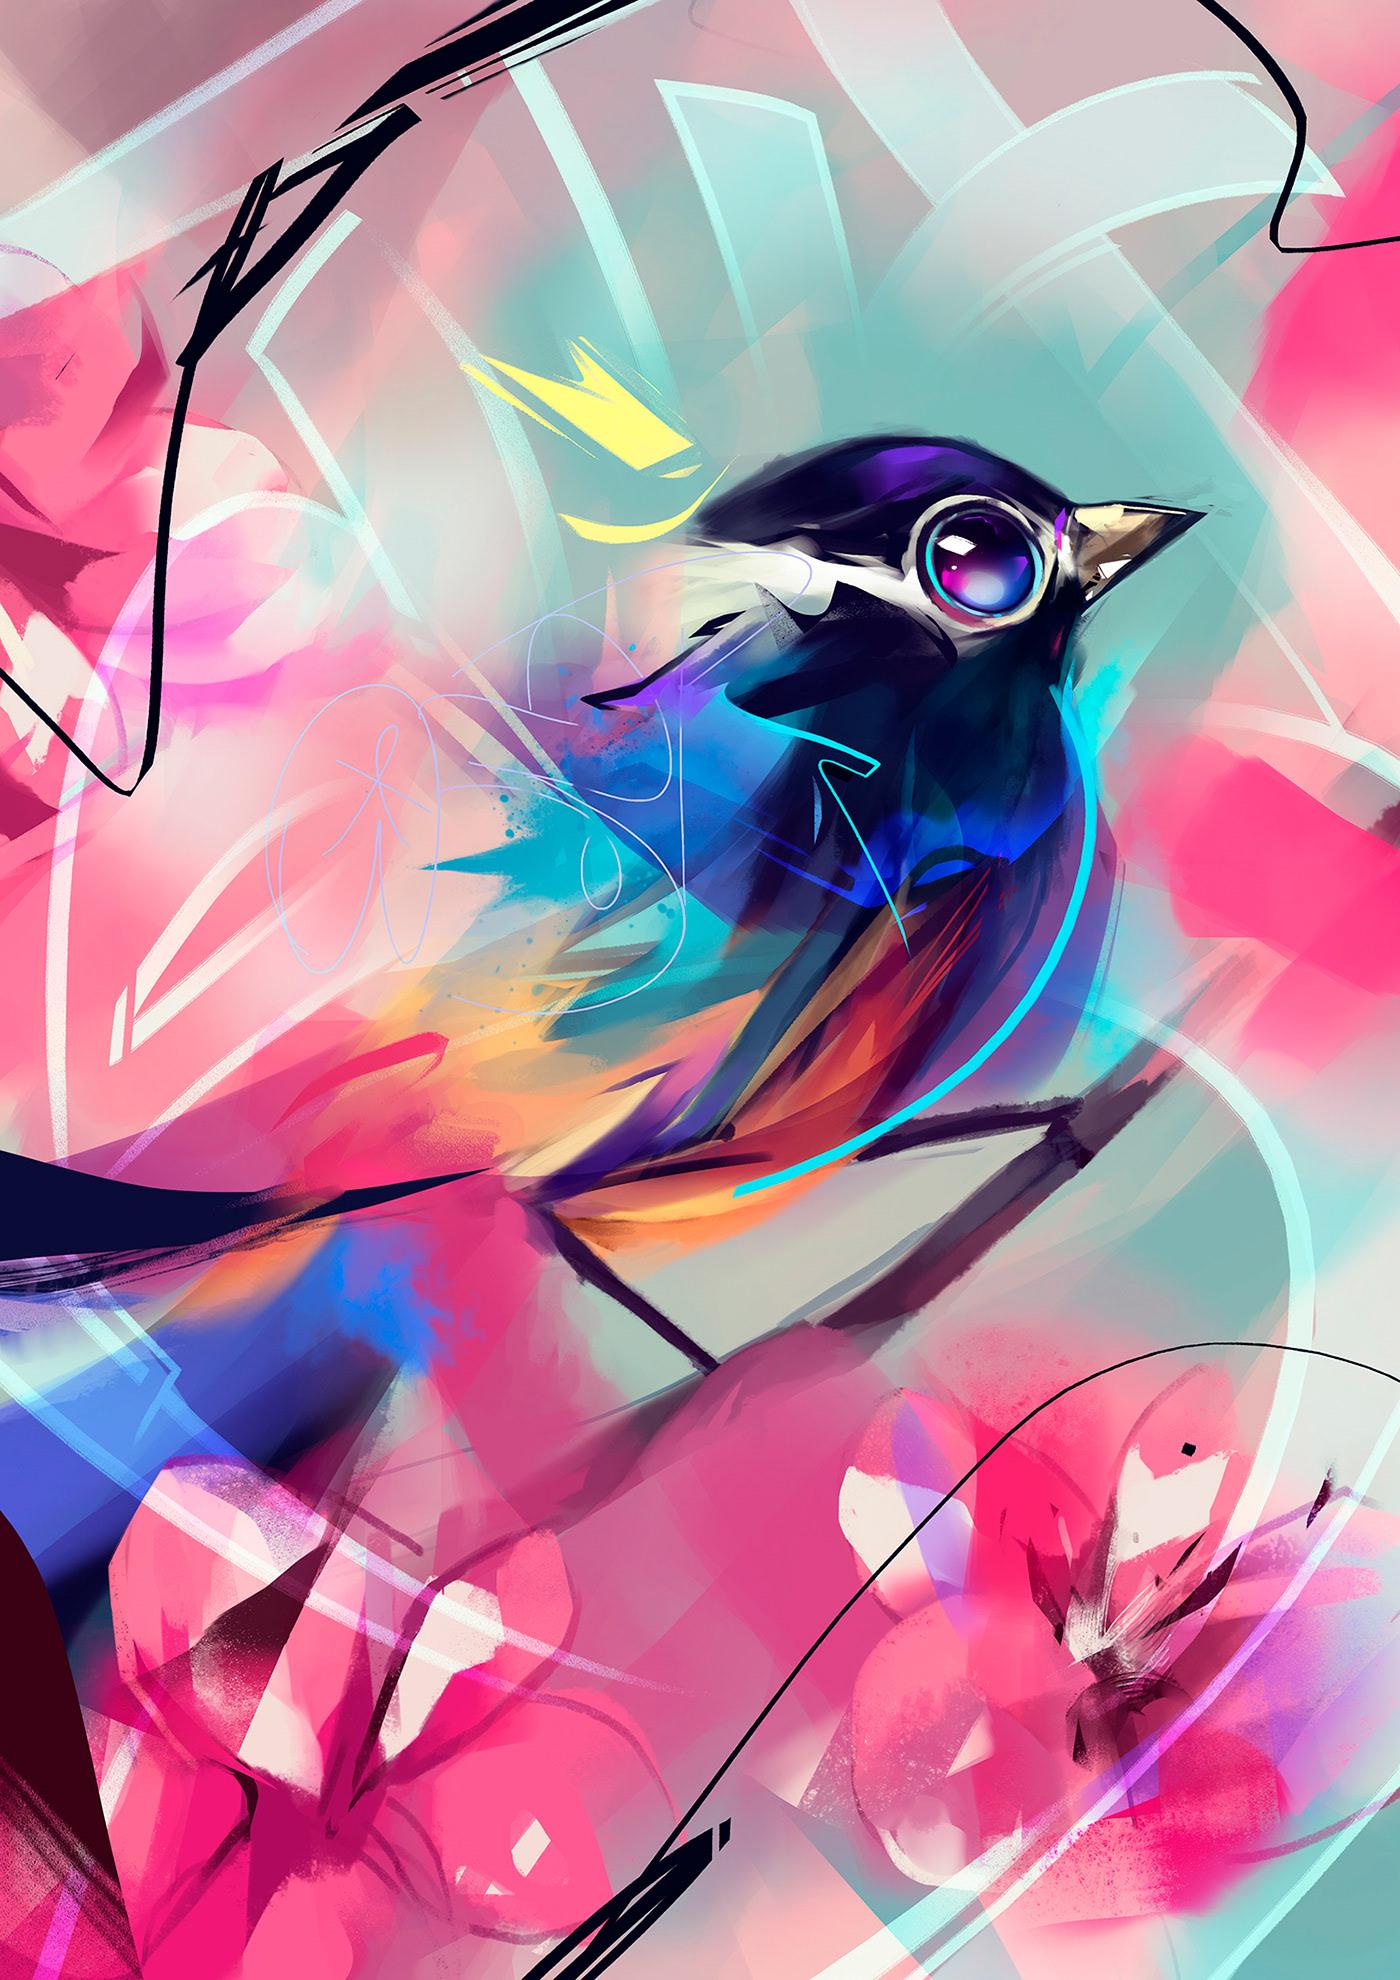 Animal Painting Studies by Guilherme Asthma